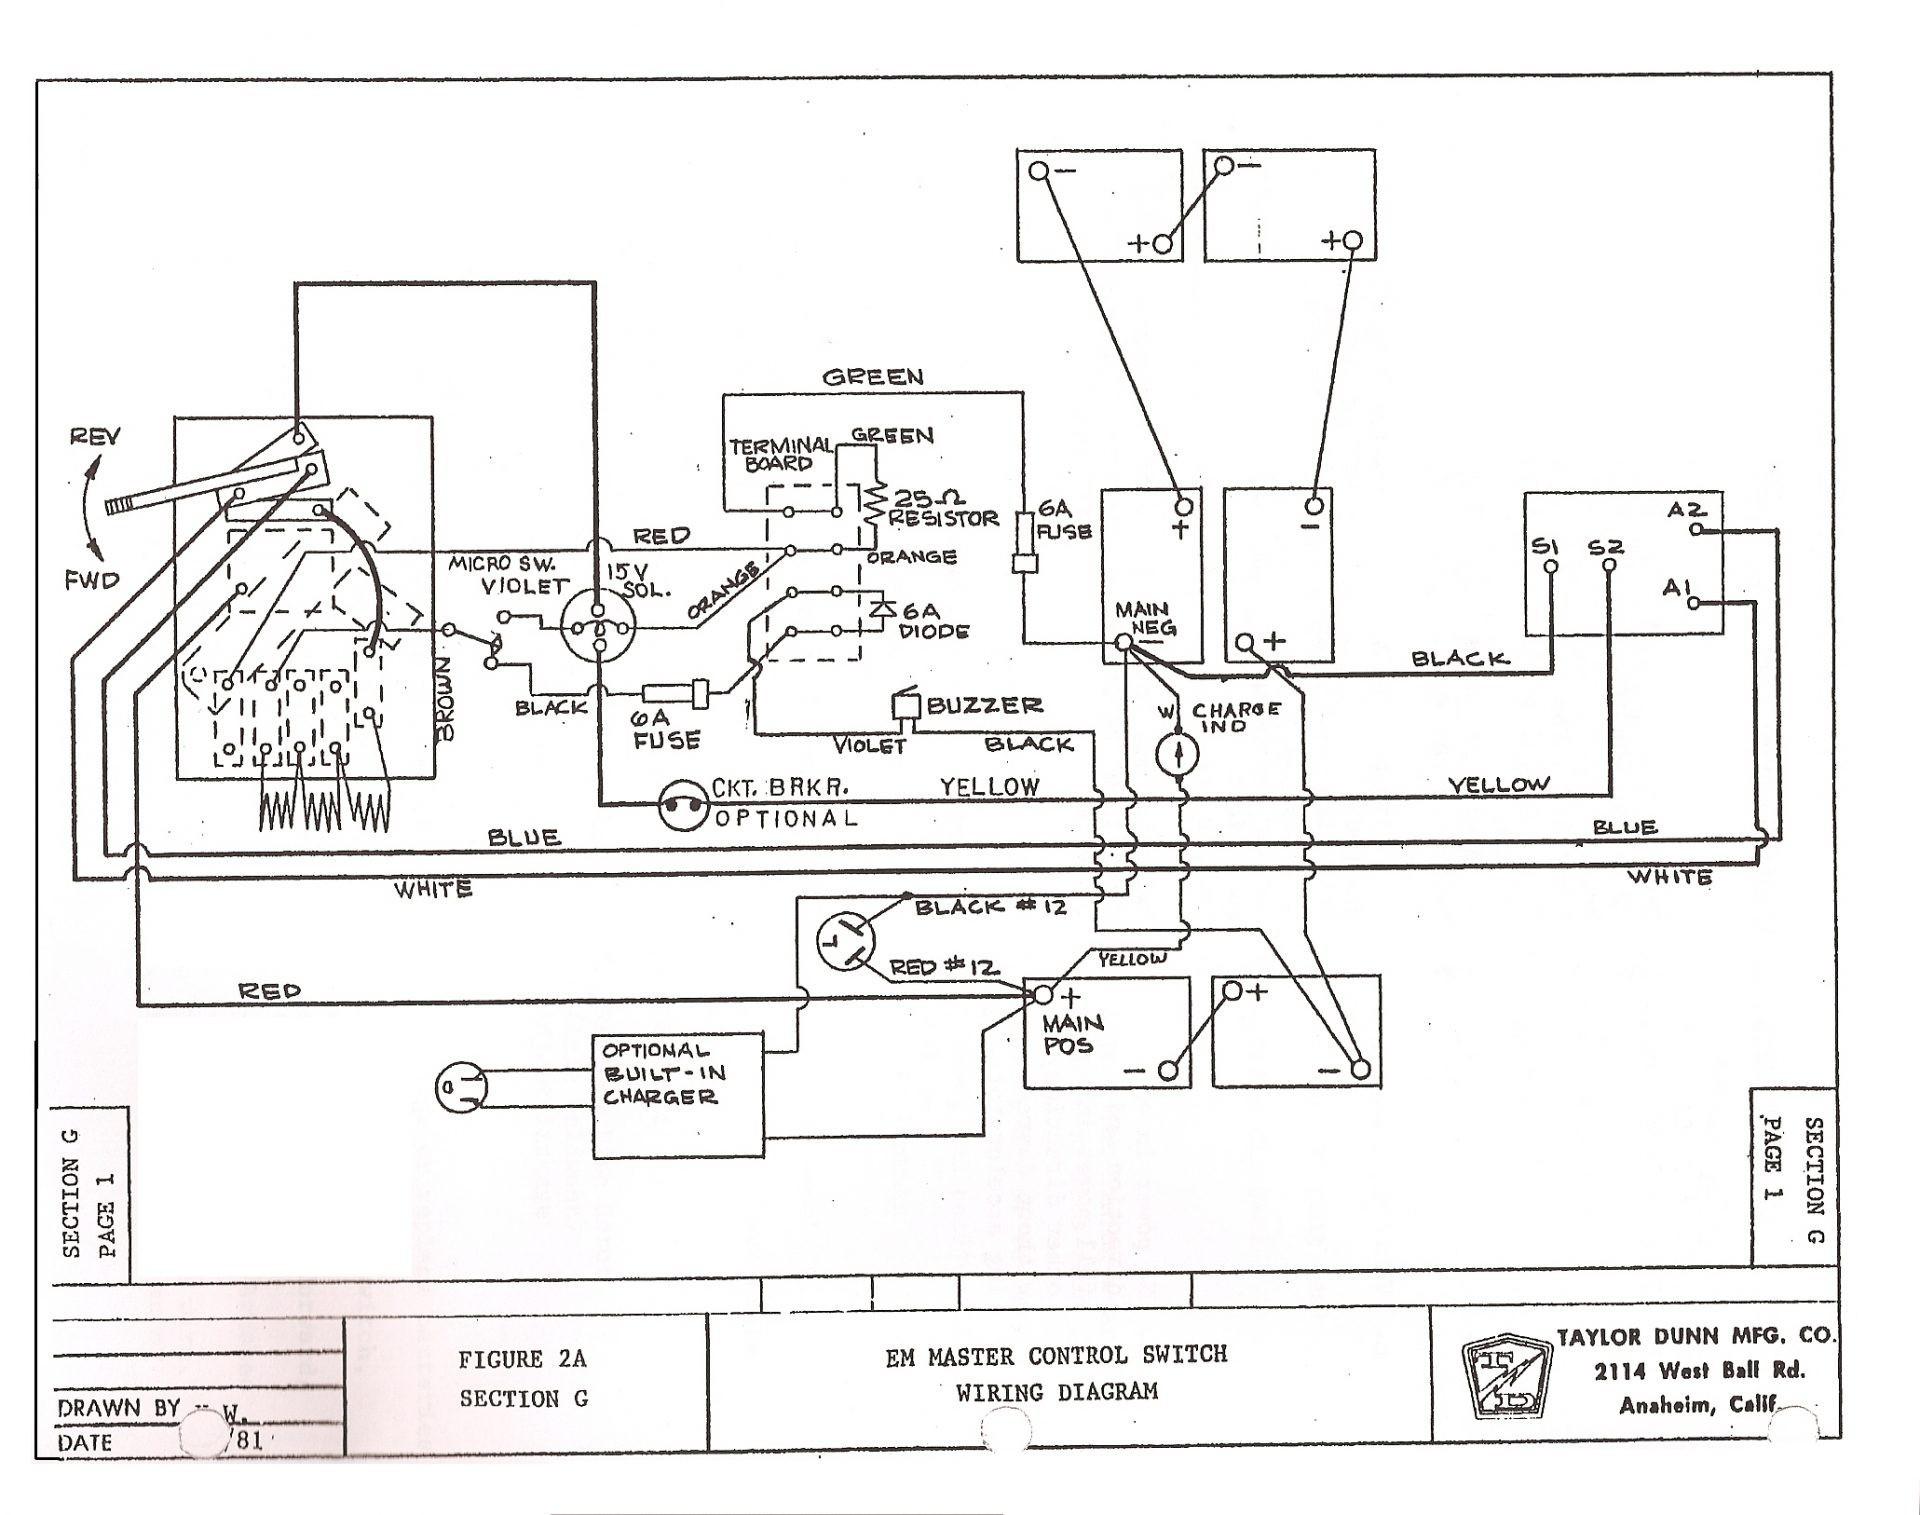 ez go electric golf cart wiring diagram new ez go gas golf cart troubleshooting choice image free of ez go electric golf cart wiring diagram